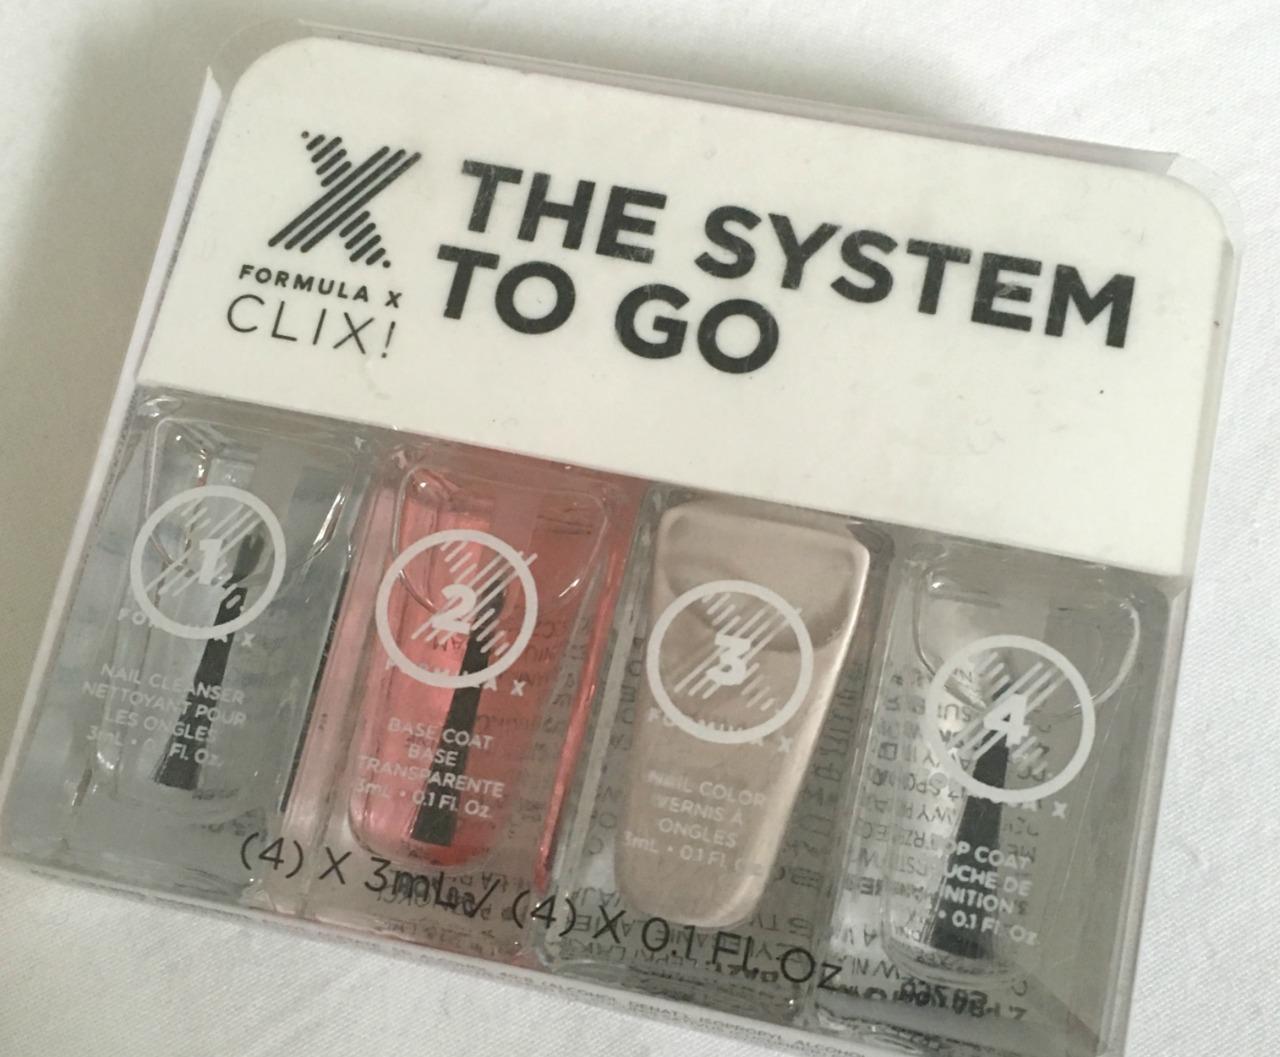 formula-x-the-system